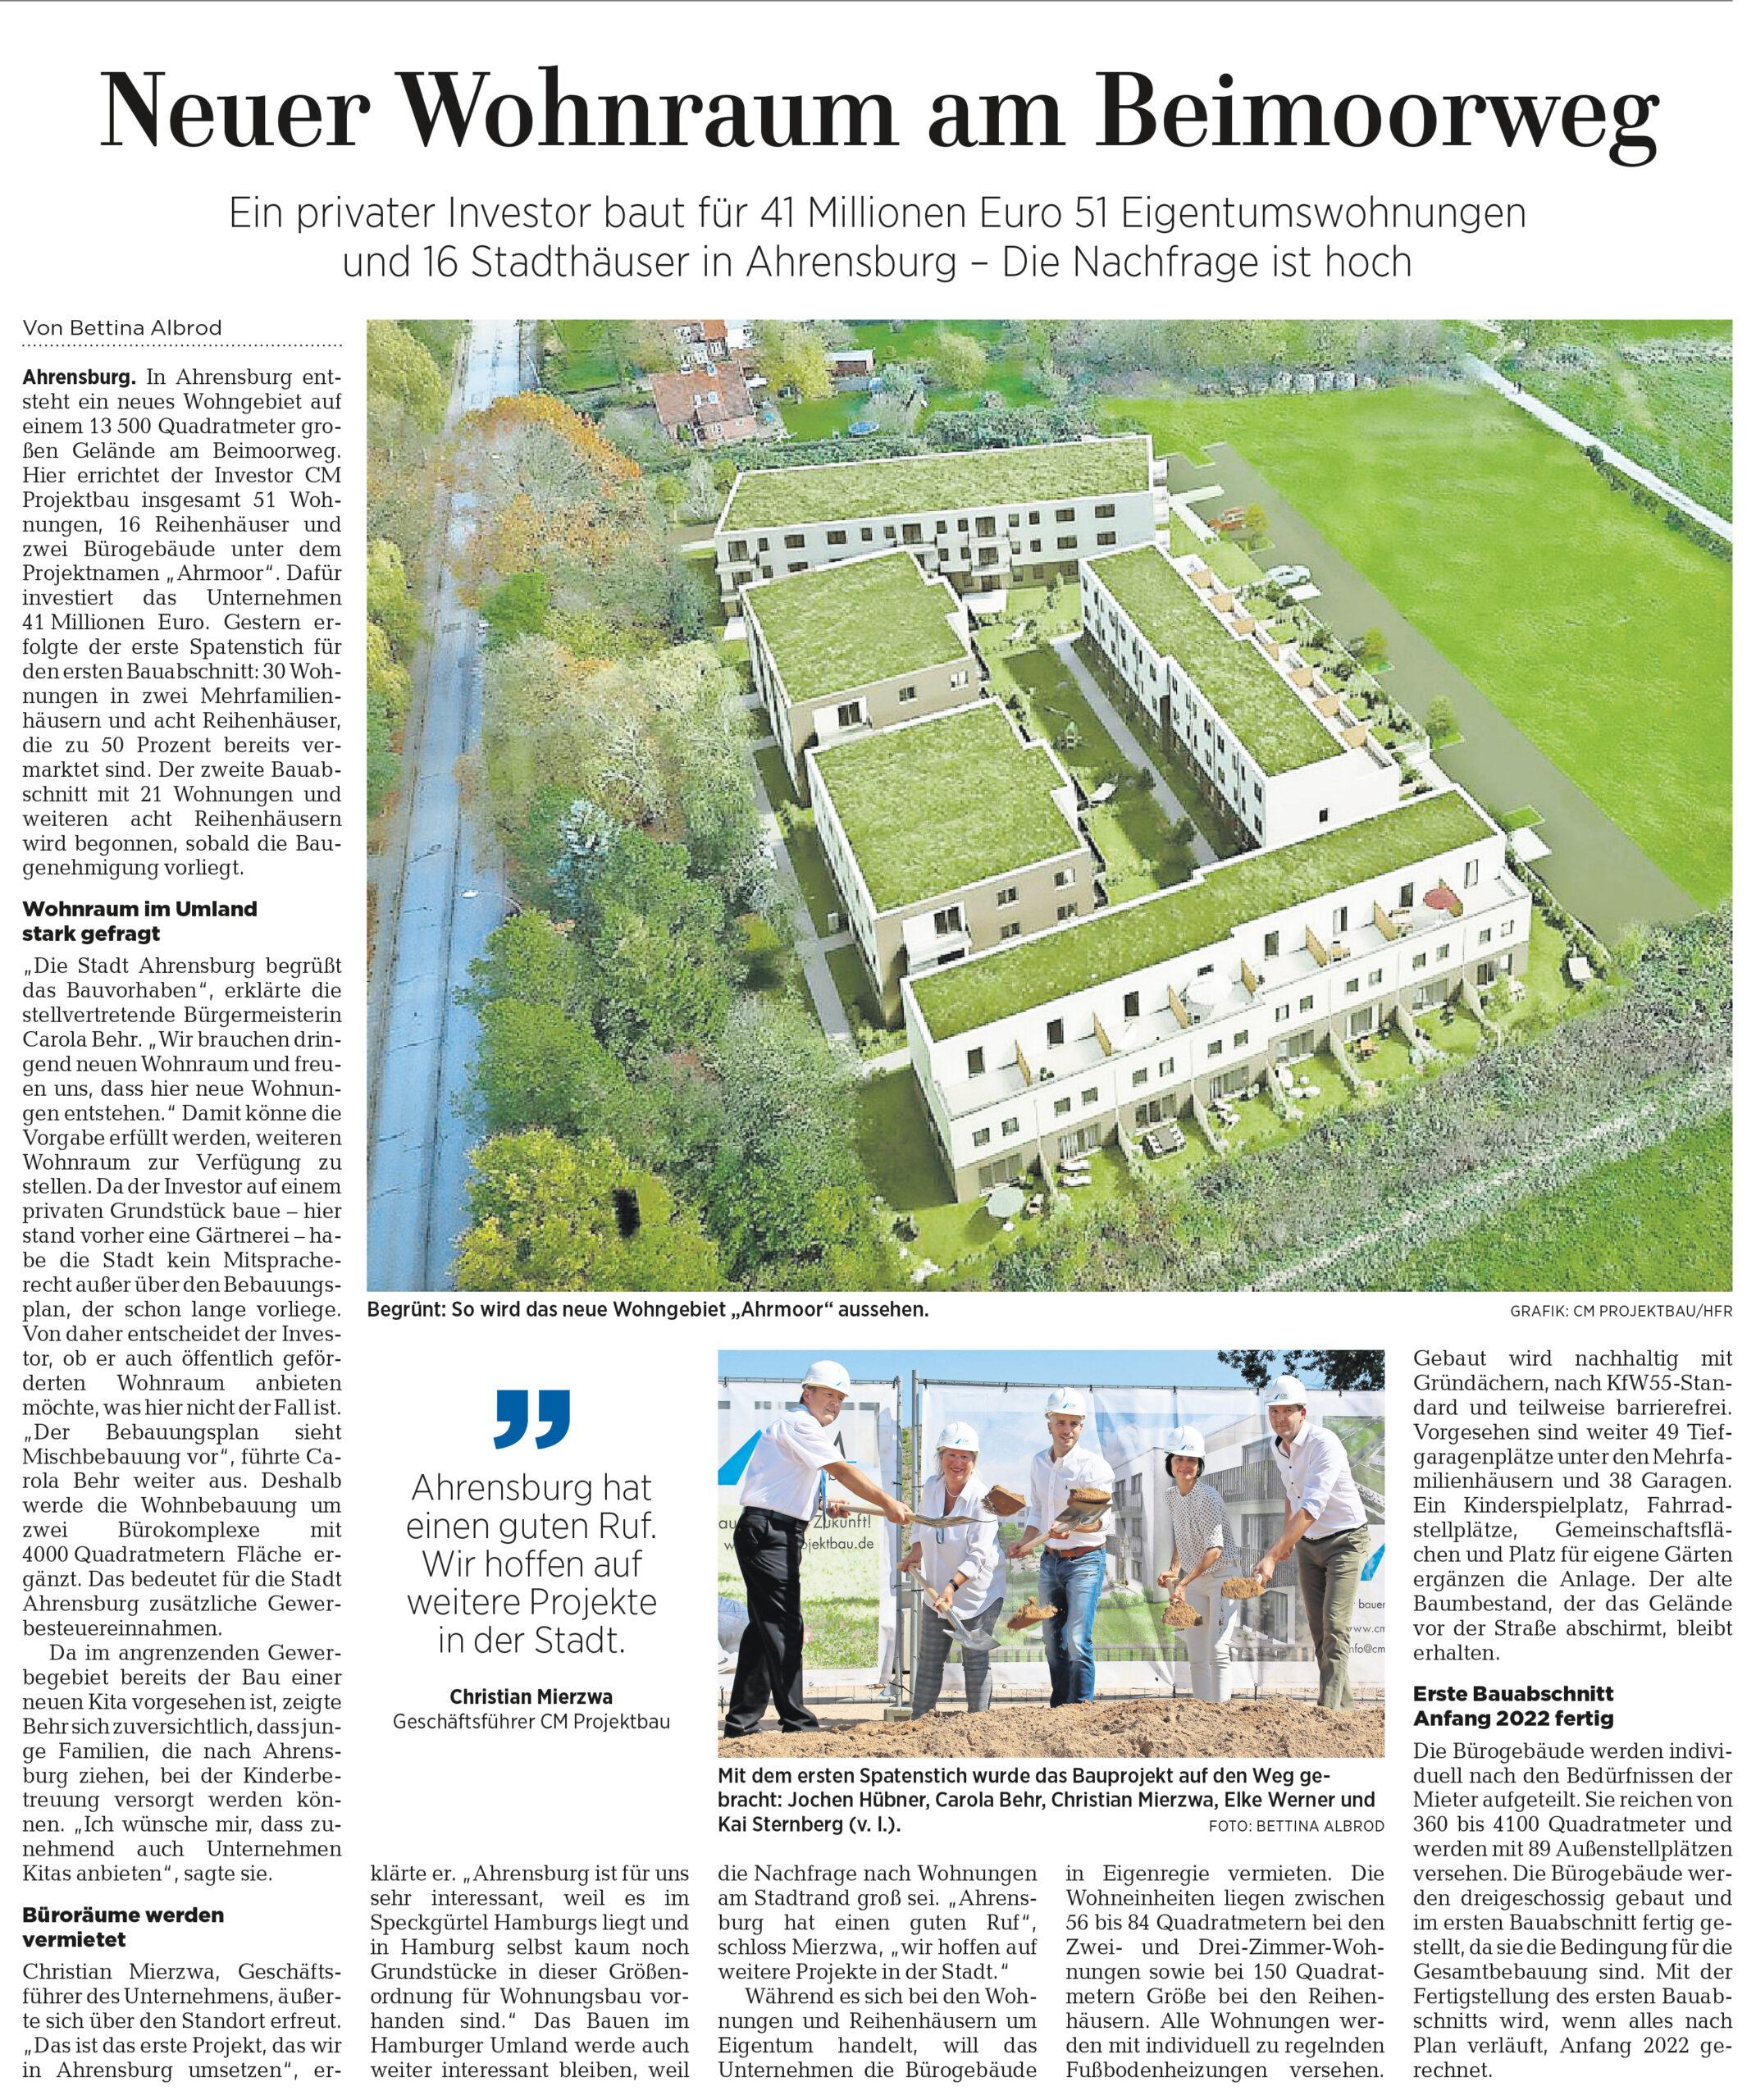 https://www.cm-projektbau.de/wp-content/uploads/2020/08/2020-08-08-Luebecker-Nachrichten-scaled.jpg